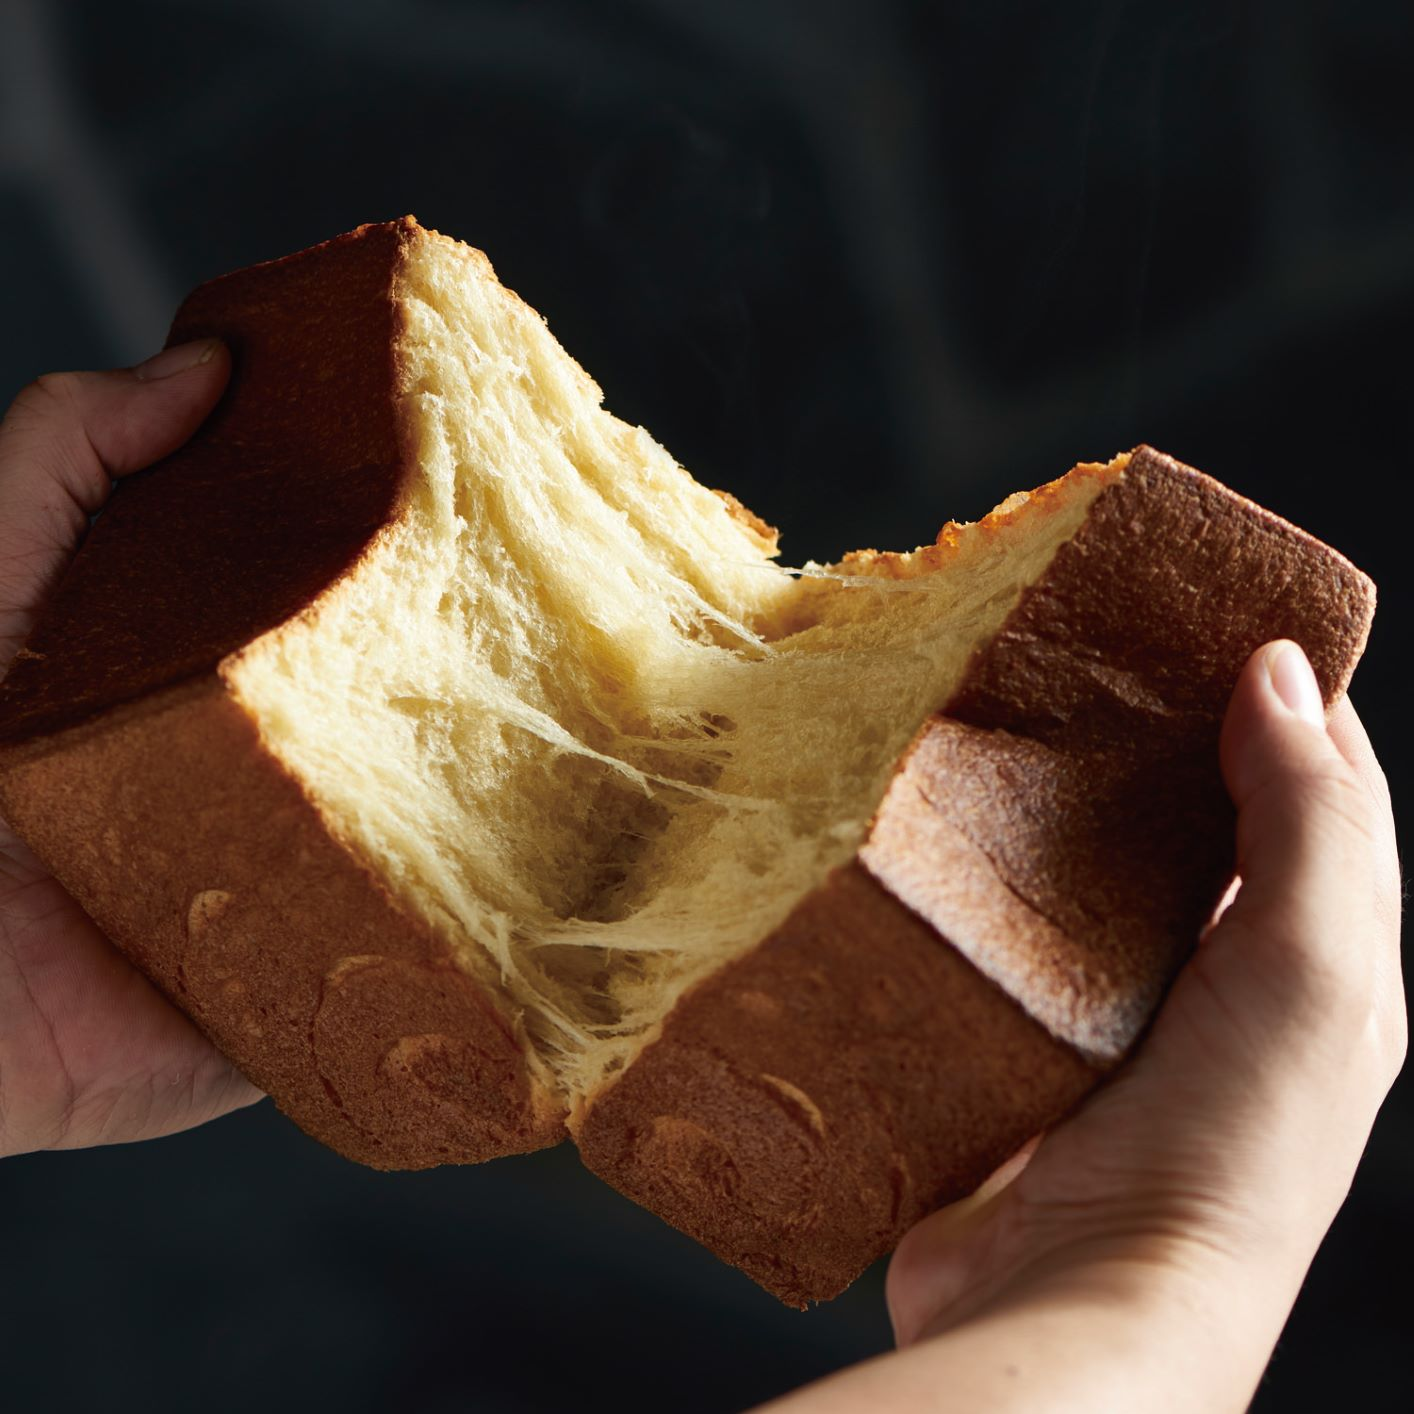 hotel koe bakery 人気食パンセット